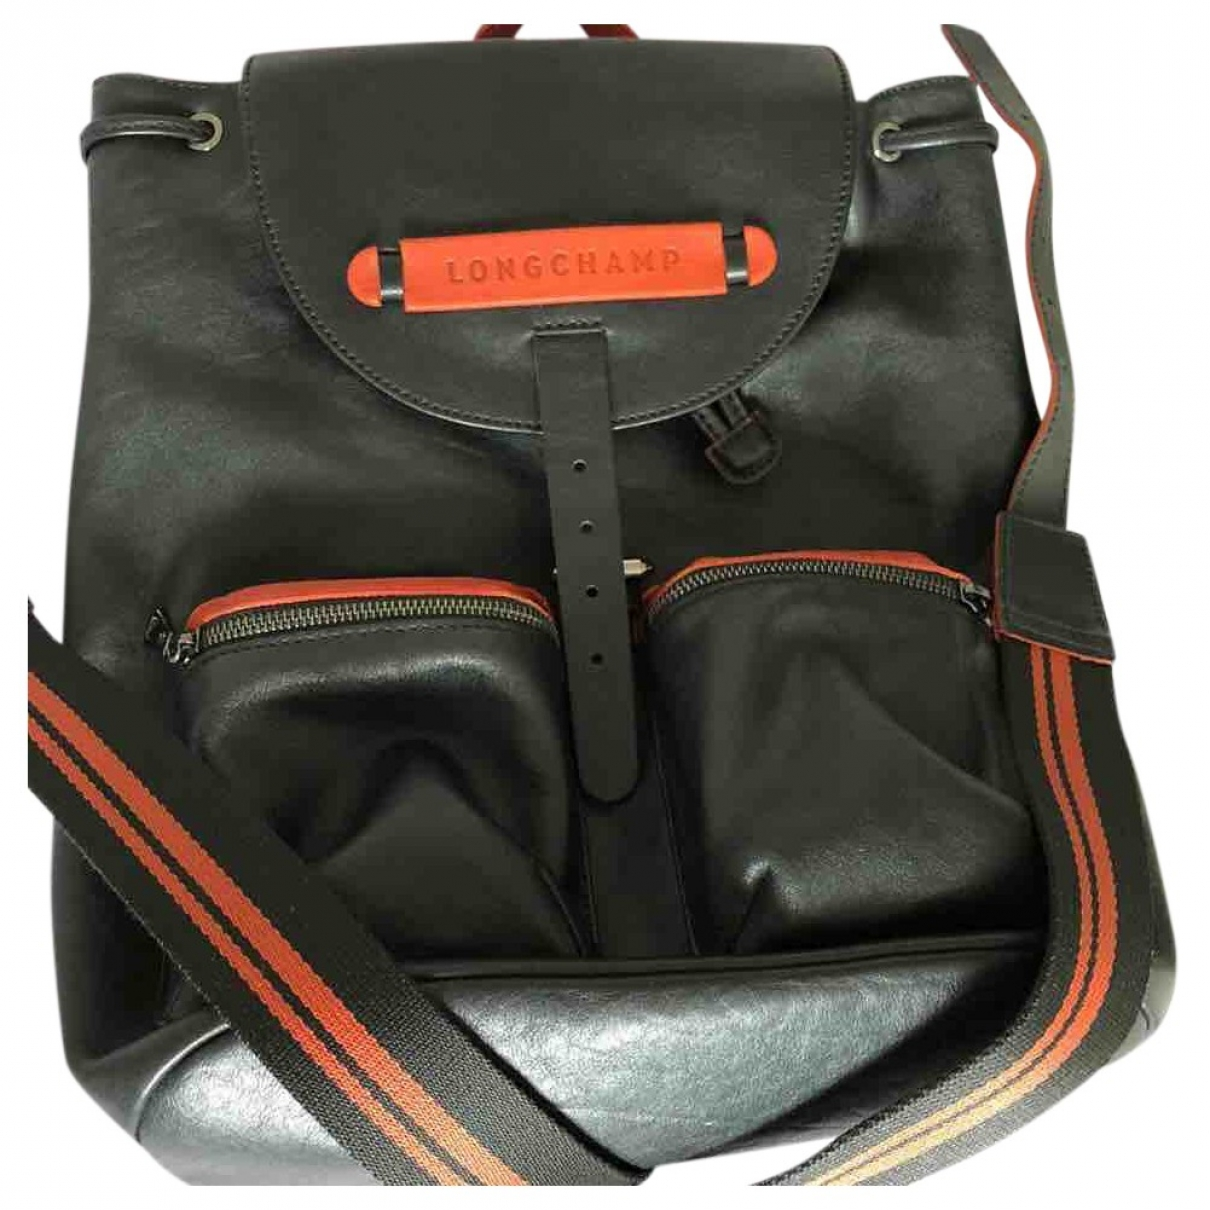 Longchamp \N Black Leather bag for Men \N